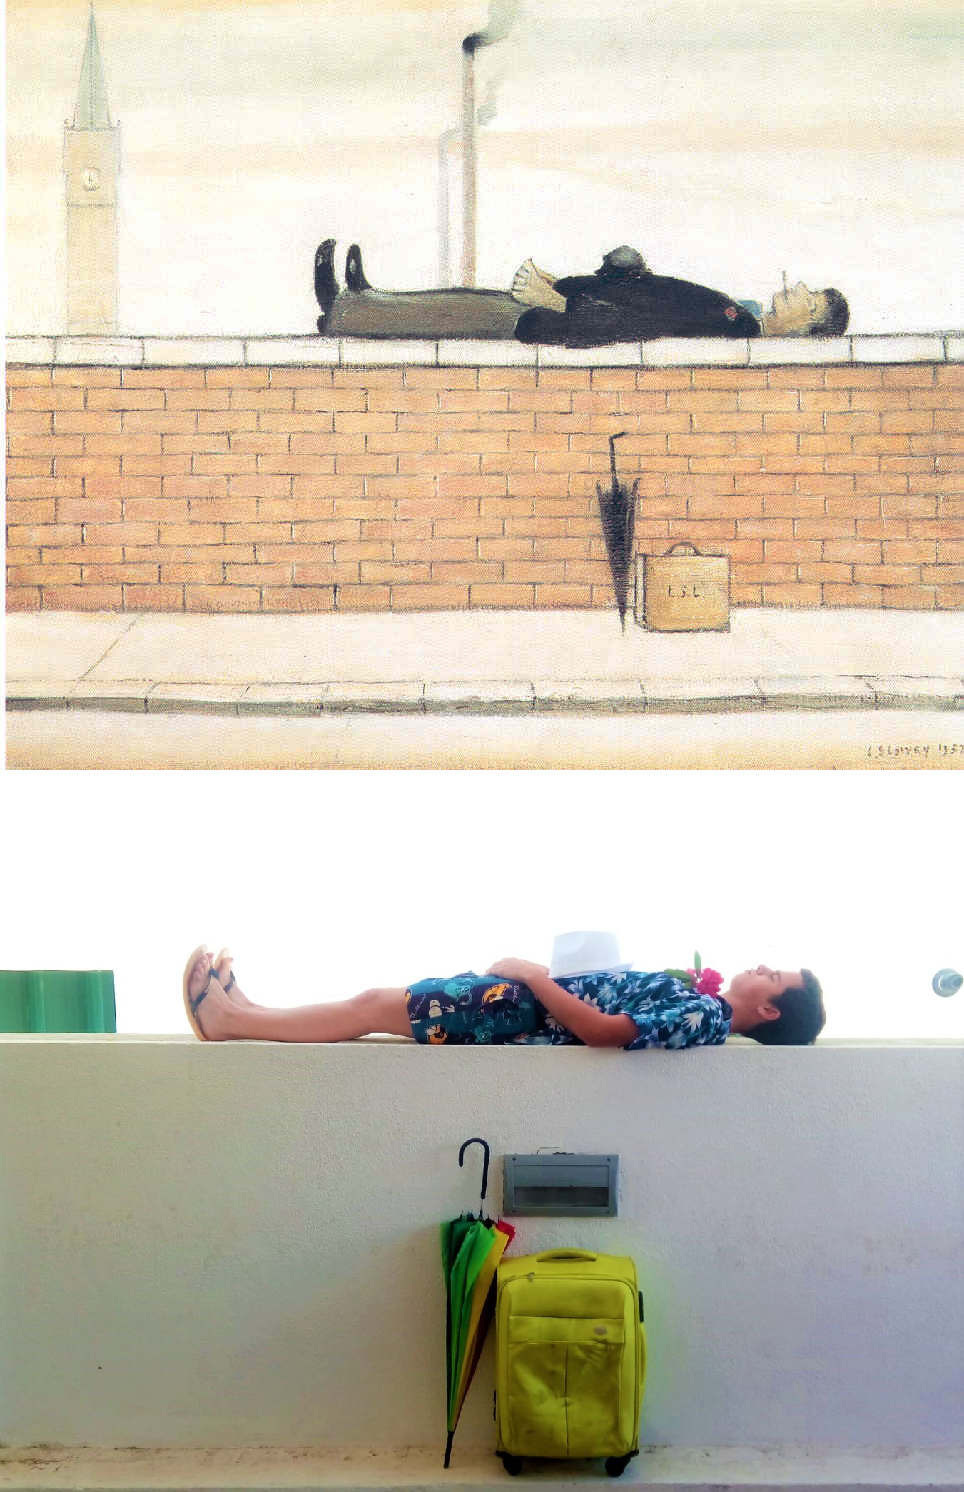 Animal Crossing Gay Porn Xvideos man lying on a wall, l s lowry (1887 – 1976) vango'dmaja